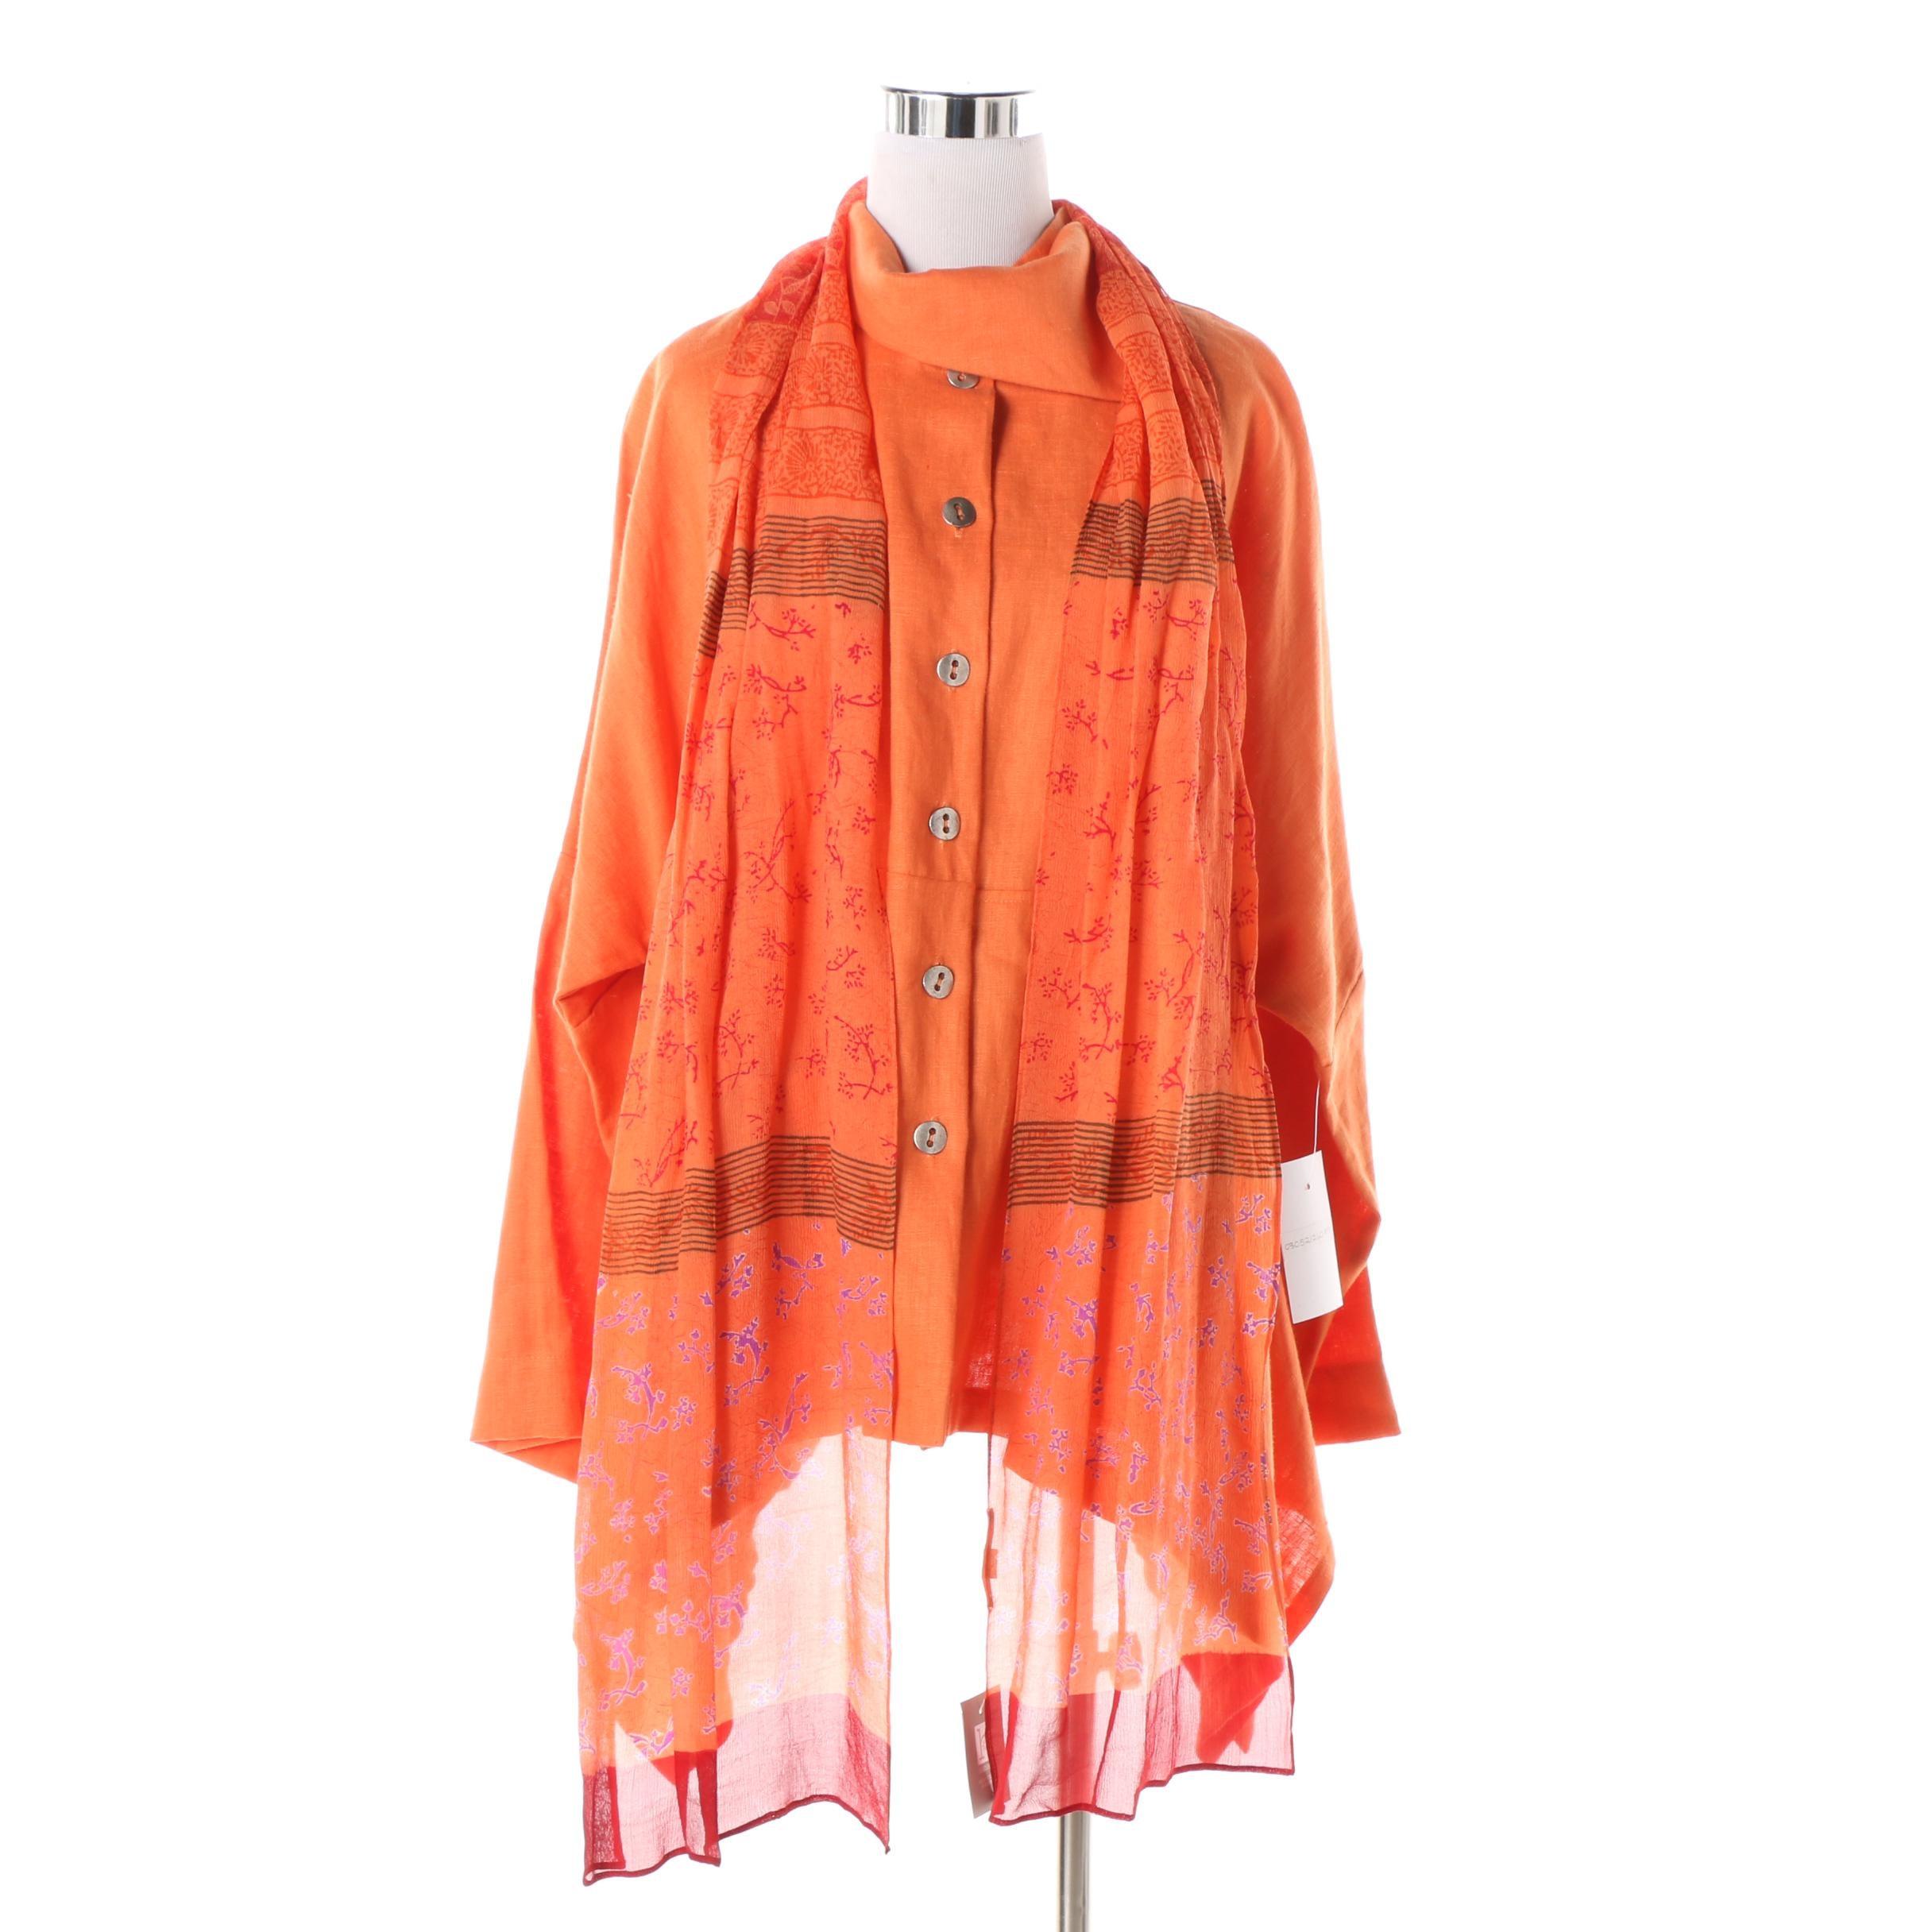 Itemz by Chris Baumgartner Orange Linen Poncho Shirt and Harshita Silk Scarf